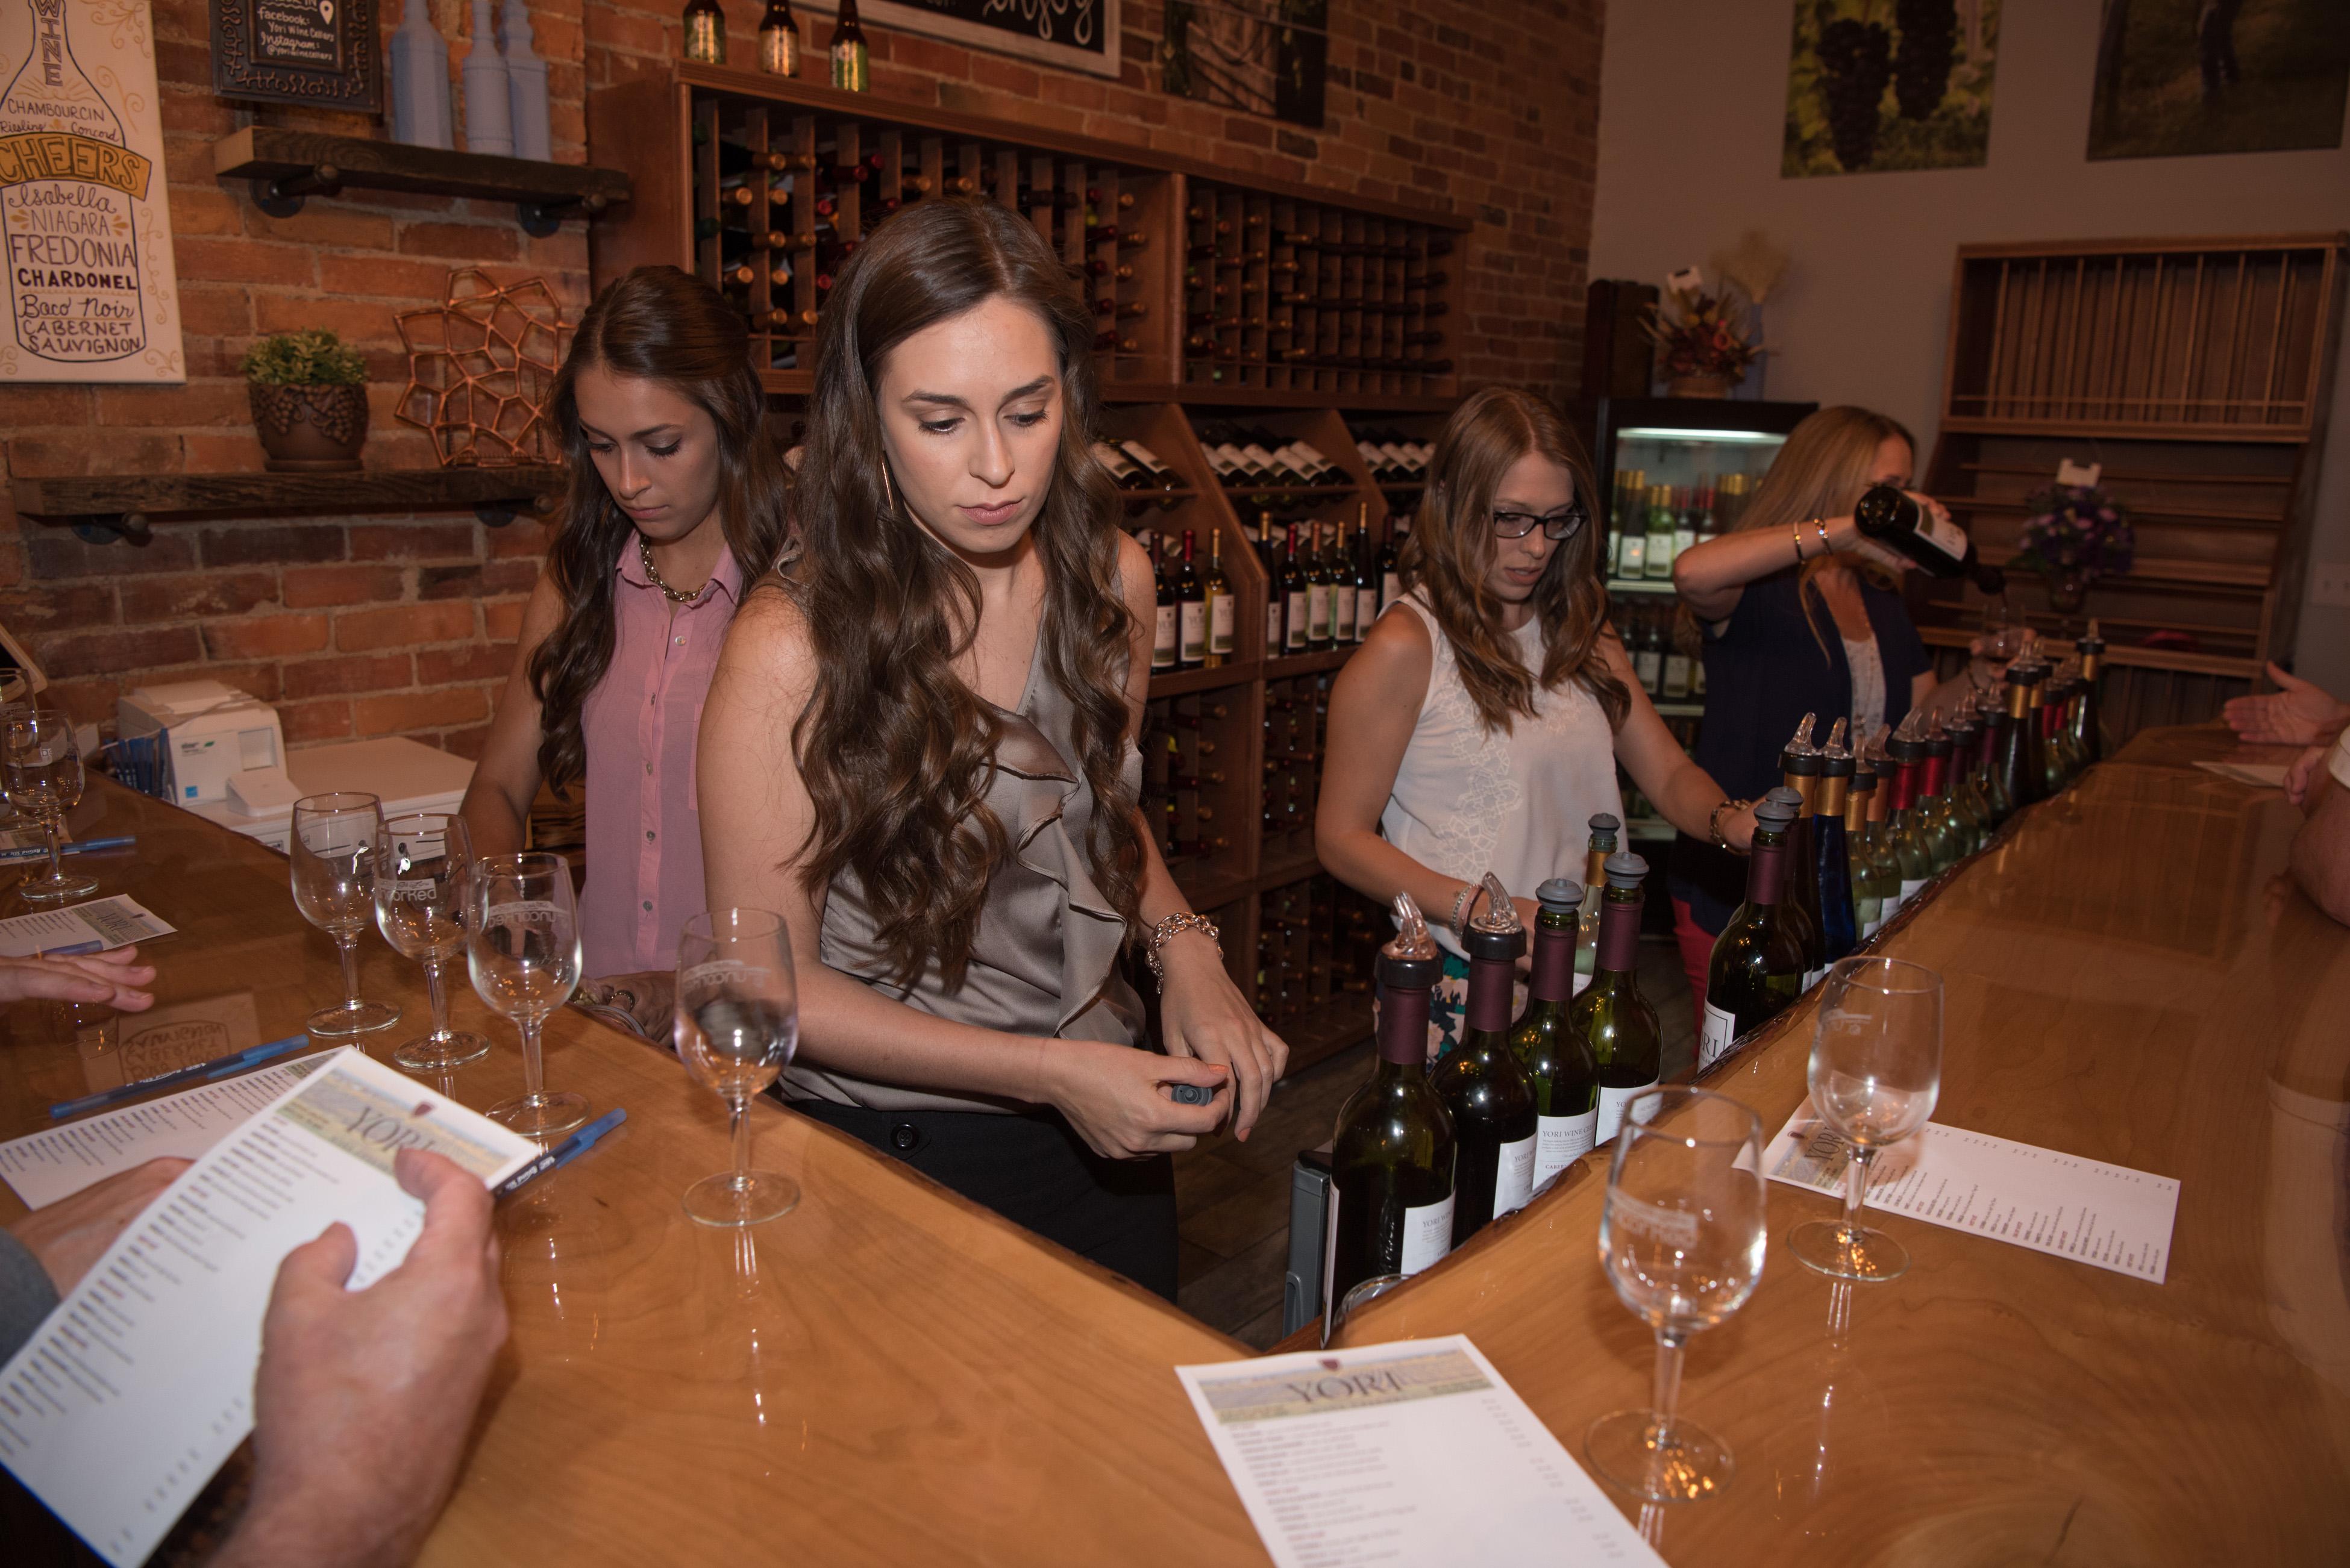 yori6 Mikaela, far left, Kariann, Allison and Lynn Yori serve samples during grand opening weekend at Yori Wine Cellars in North East, Pa.